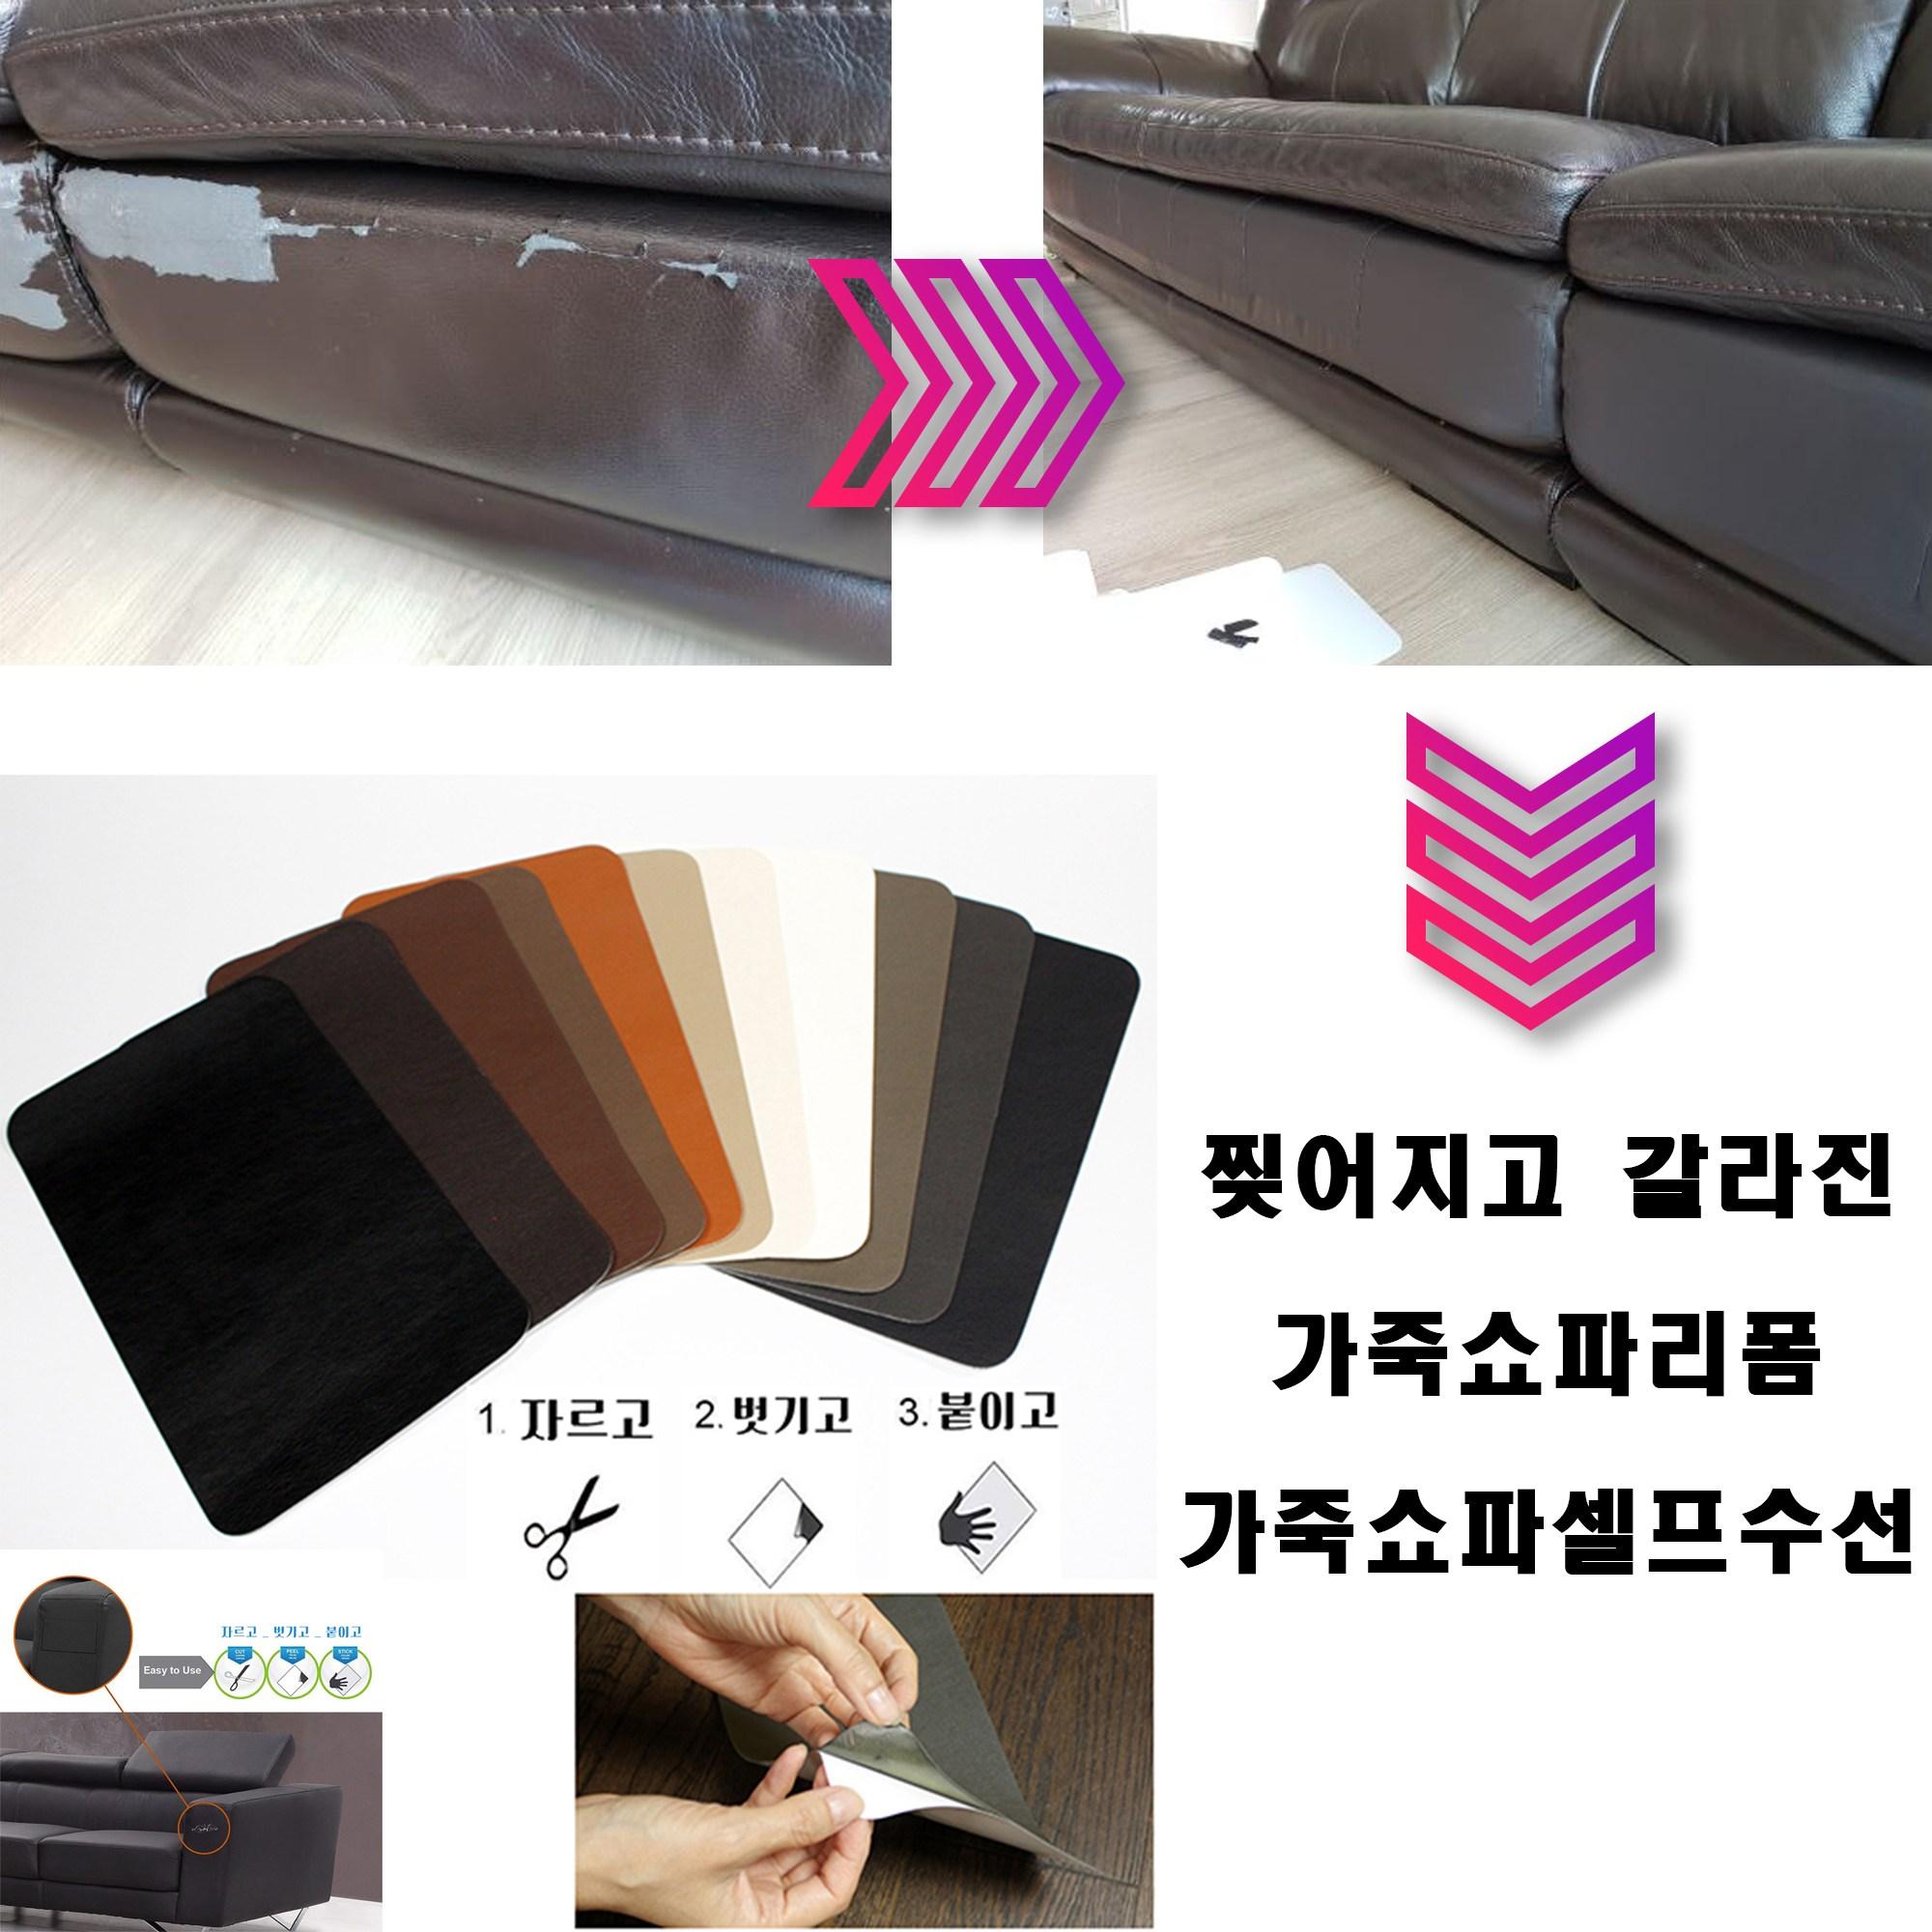 moriskorea 1+1=2 2장 15x25cm Leather Repair Self-Adhesive Patch for Sofa Seat Bag Craft do-it-yourself Car, 8 우유색 아이보리 IVORY